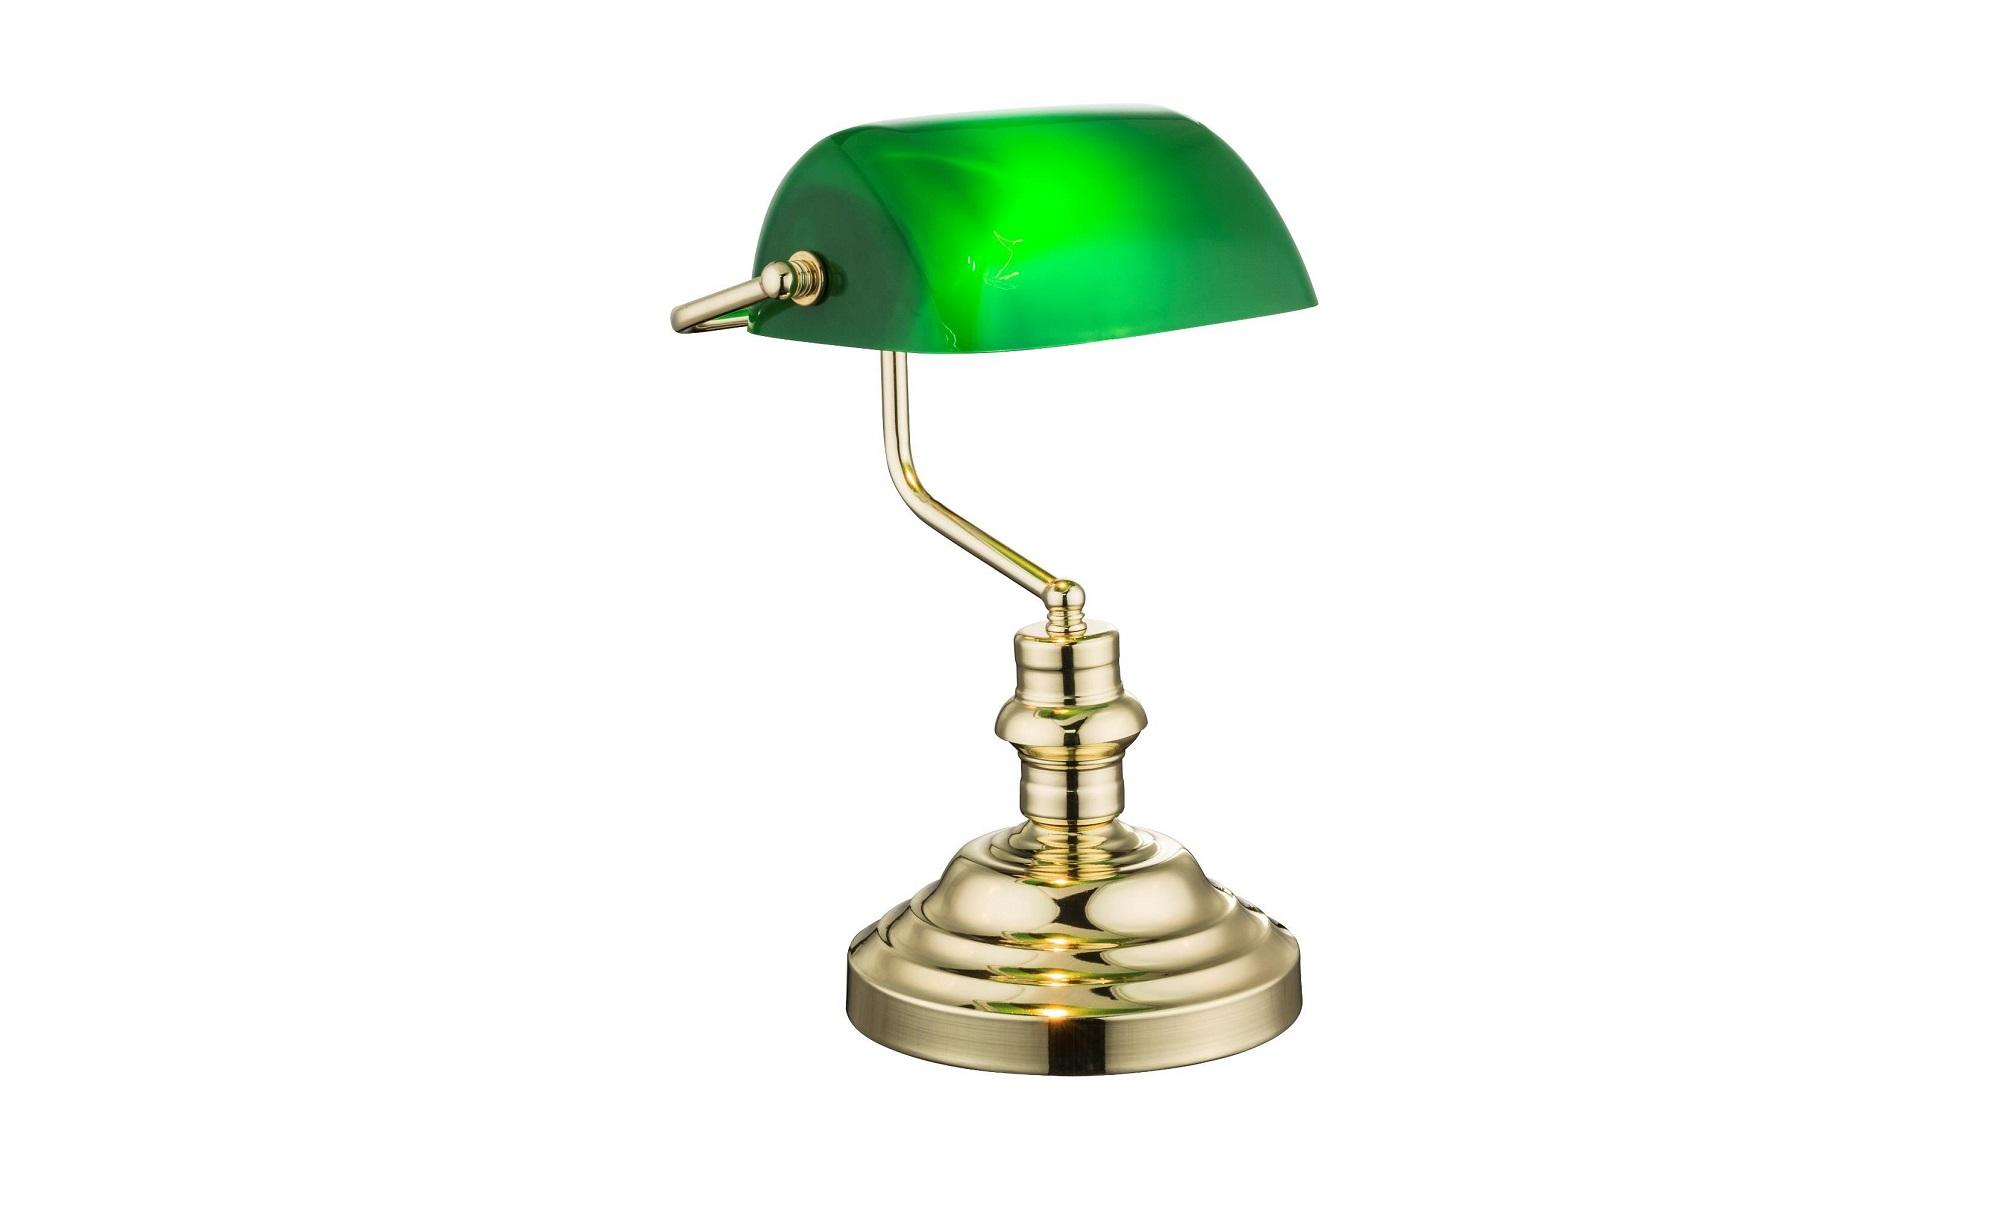 Настольная лампаДекоративные лампы<br>&amp;lt;div&amp;gt;Вид цоколя: E27&amp;lt;/div&amp;gt;&amp;lt;div&amp;gt;Мощность: 60W&amp;lt;/div&amp;gt;&amp;lt;div&amp;gt;Количество ламп: 1&amp;lt;/div&amp;gt;&amp;lt;div&amp;gt;&amp;lt;br&amp;gt;&amp;lt;/div&amp;gt;&amp;lt;div&amp;gt;Материал: металл, акрил&amp;lt;/div&amp;gt;<br><br>Material: Металл<br>Ширина см: 26<br>Высота см: 36<br>Глубина см: 19